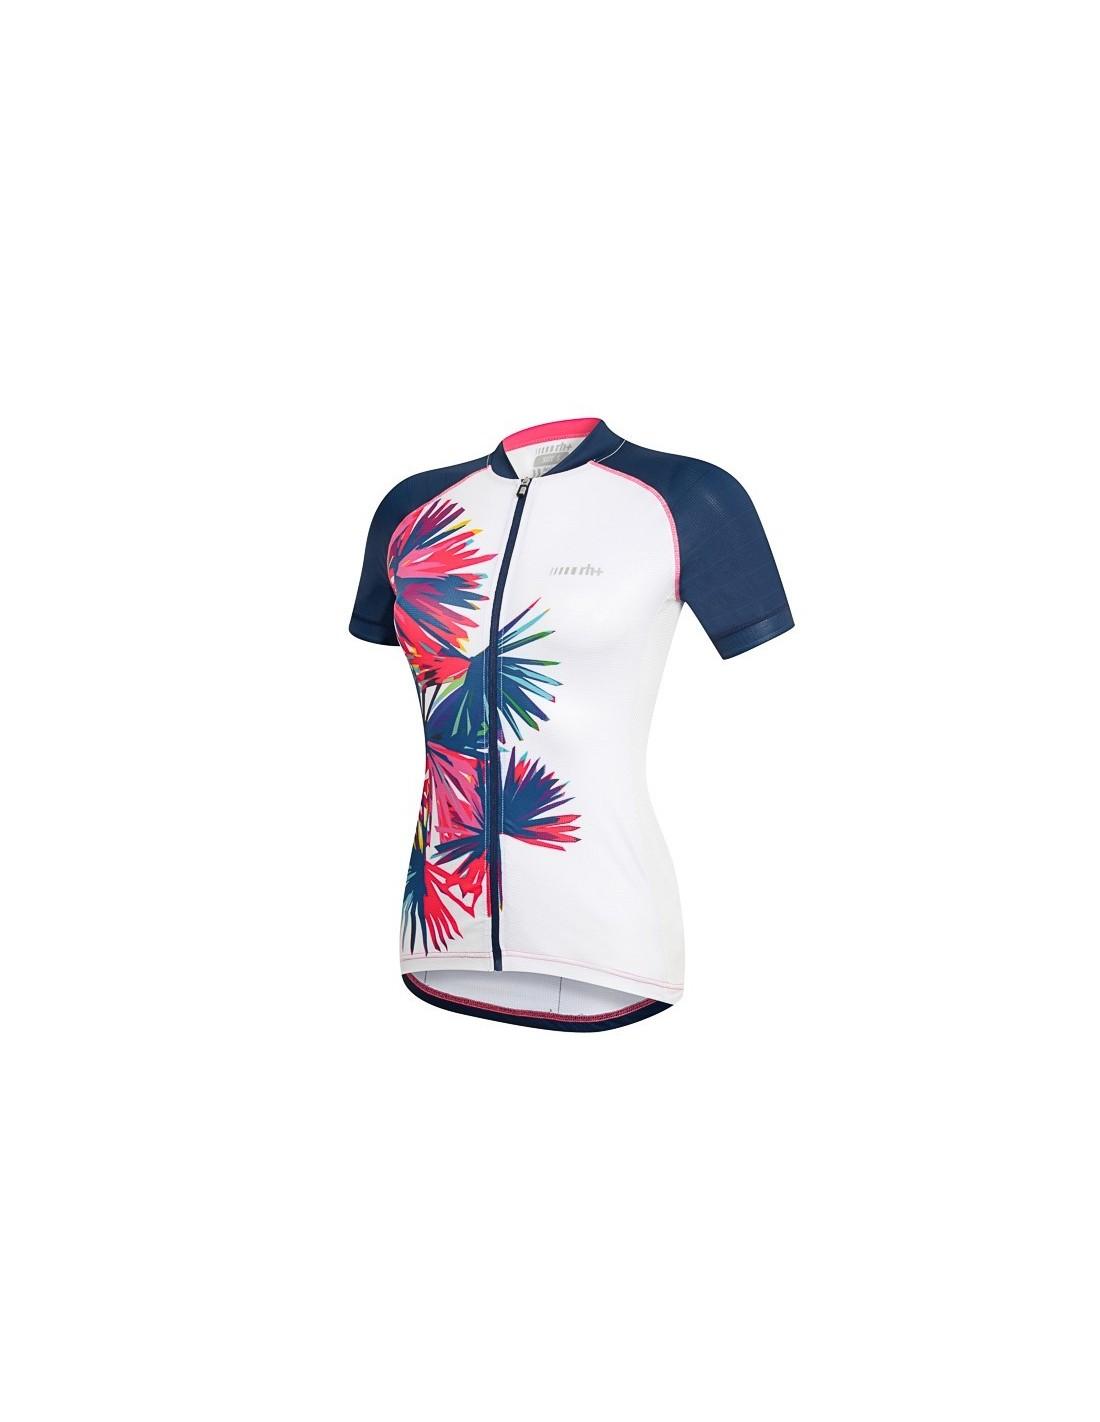 Venus-W-Jersey-PRT-Maglia-Ciclismo-Donna-rh